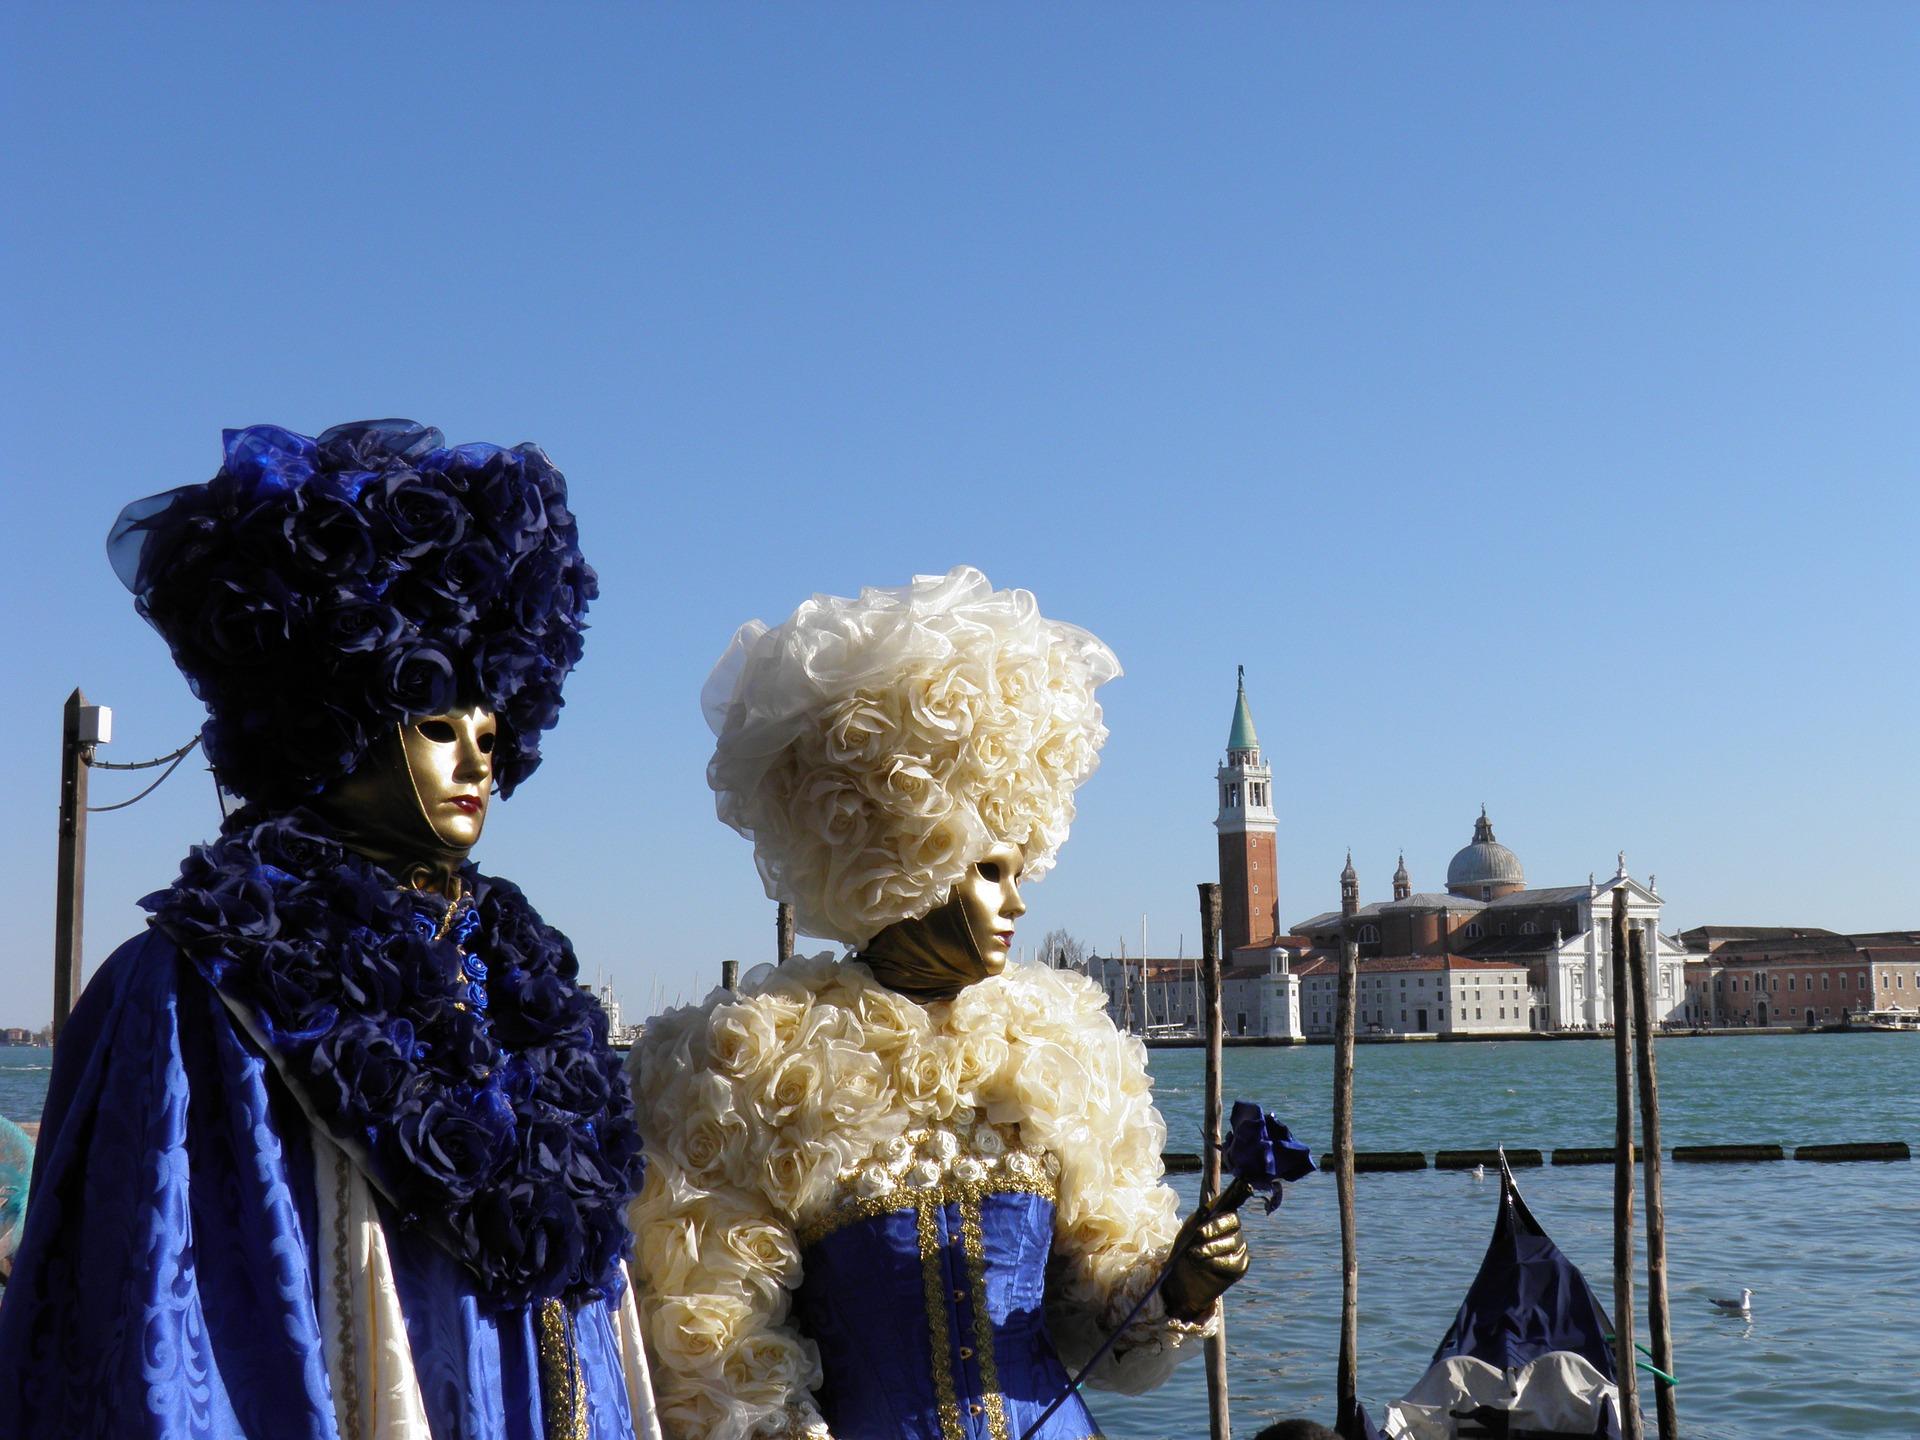 Karneval in Venedig feiern Italien - ab 39,00€ hin & zurück fliegen